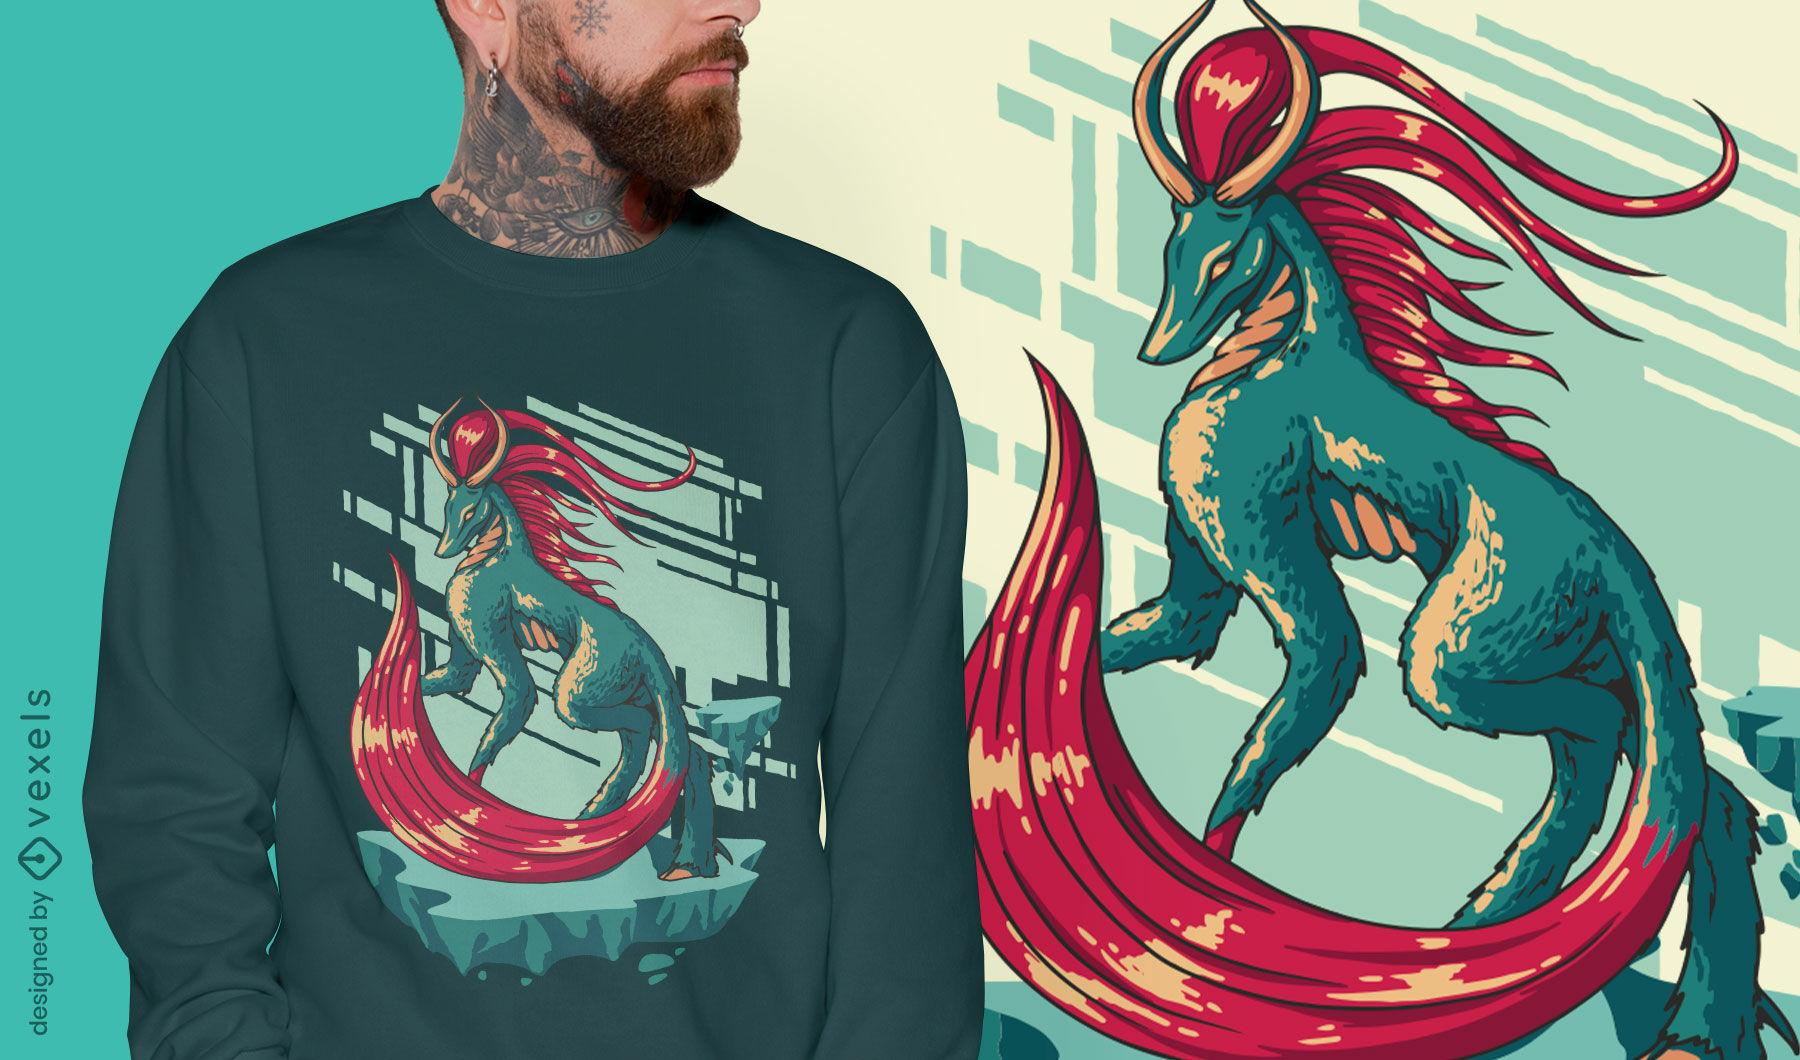 Animal nightmare monster t-shirt design